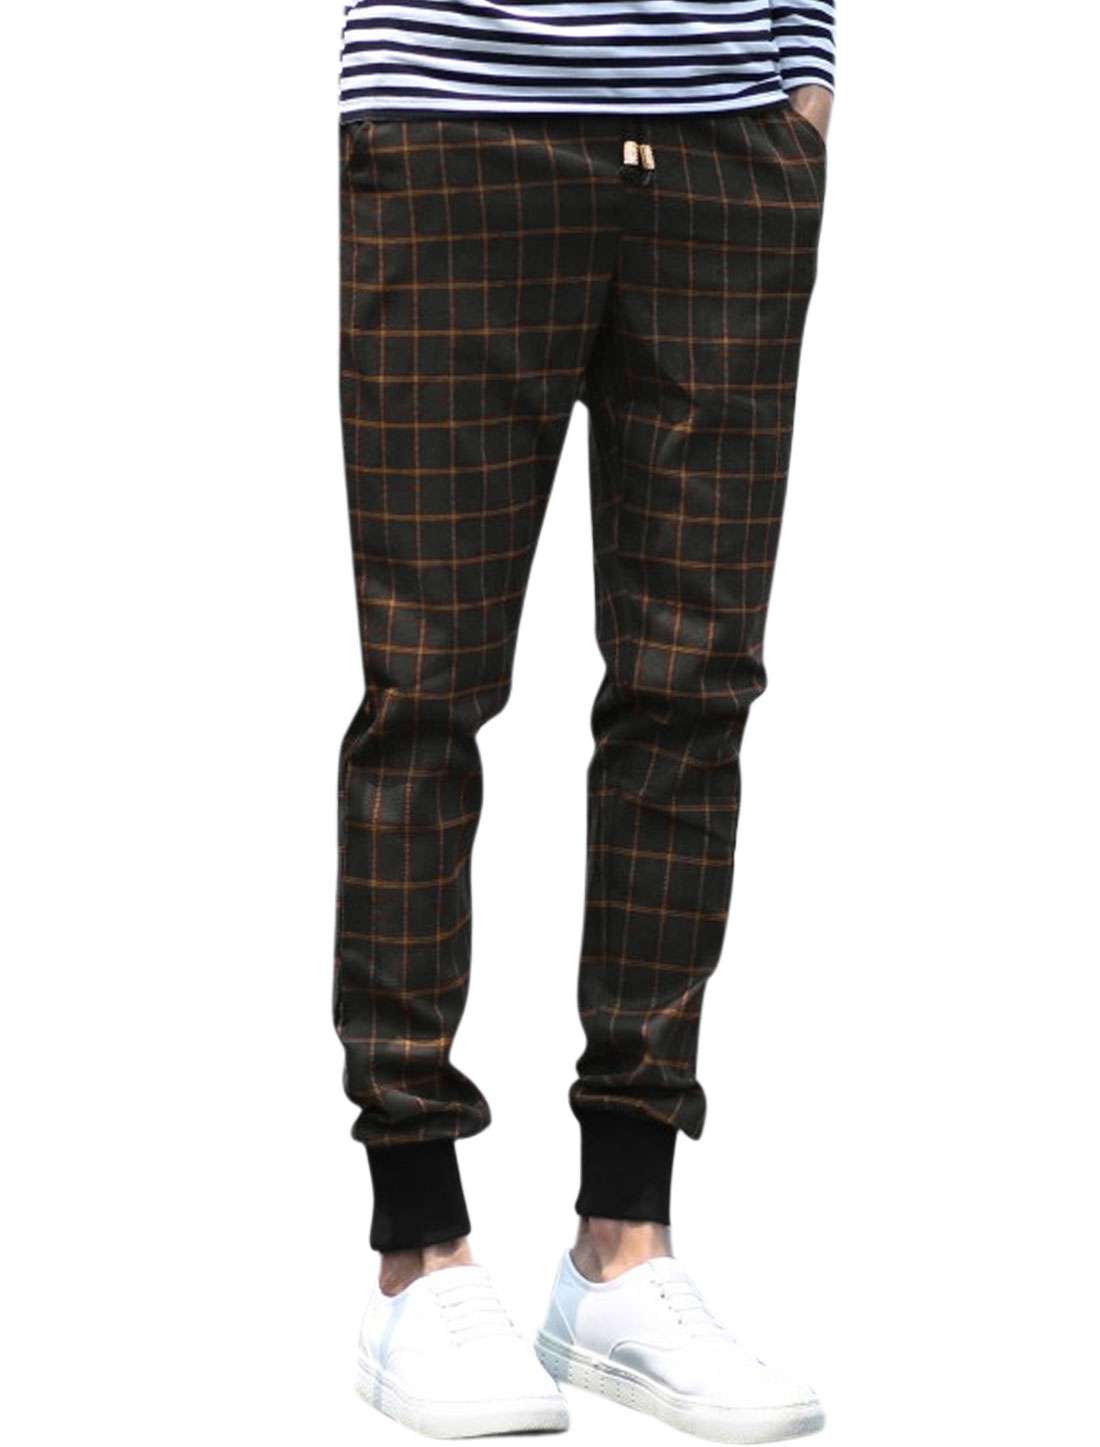 Men Drawstring Waist Plaids Slant Pockets Casual Pants Black W32